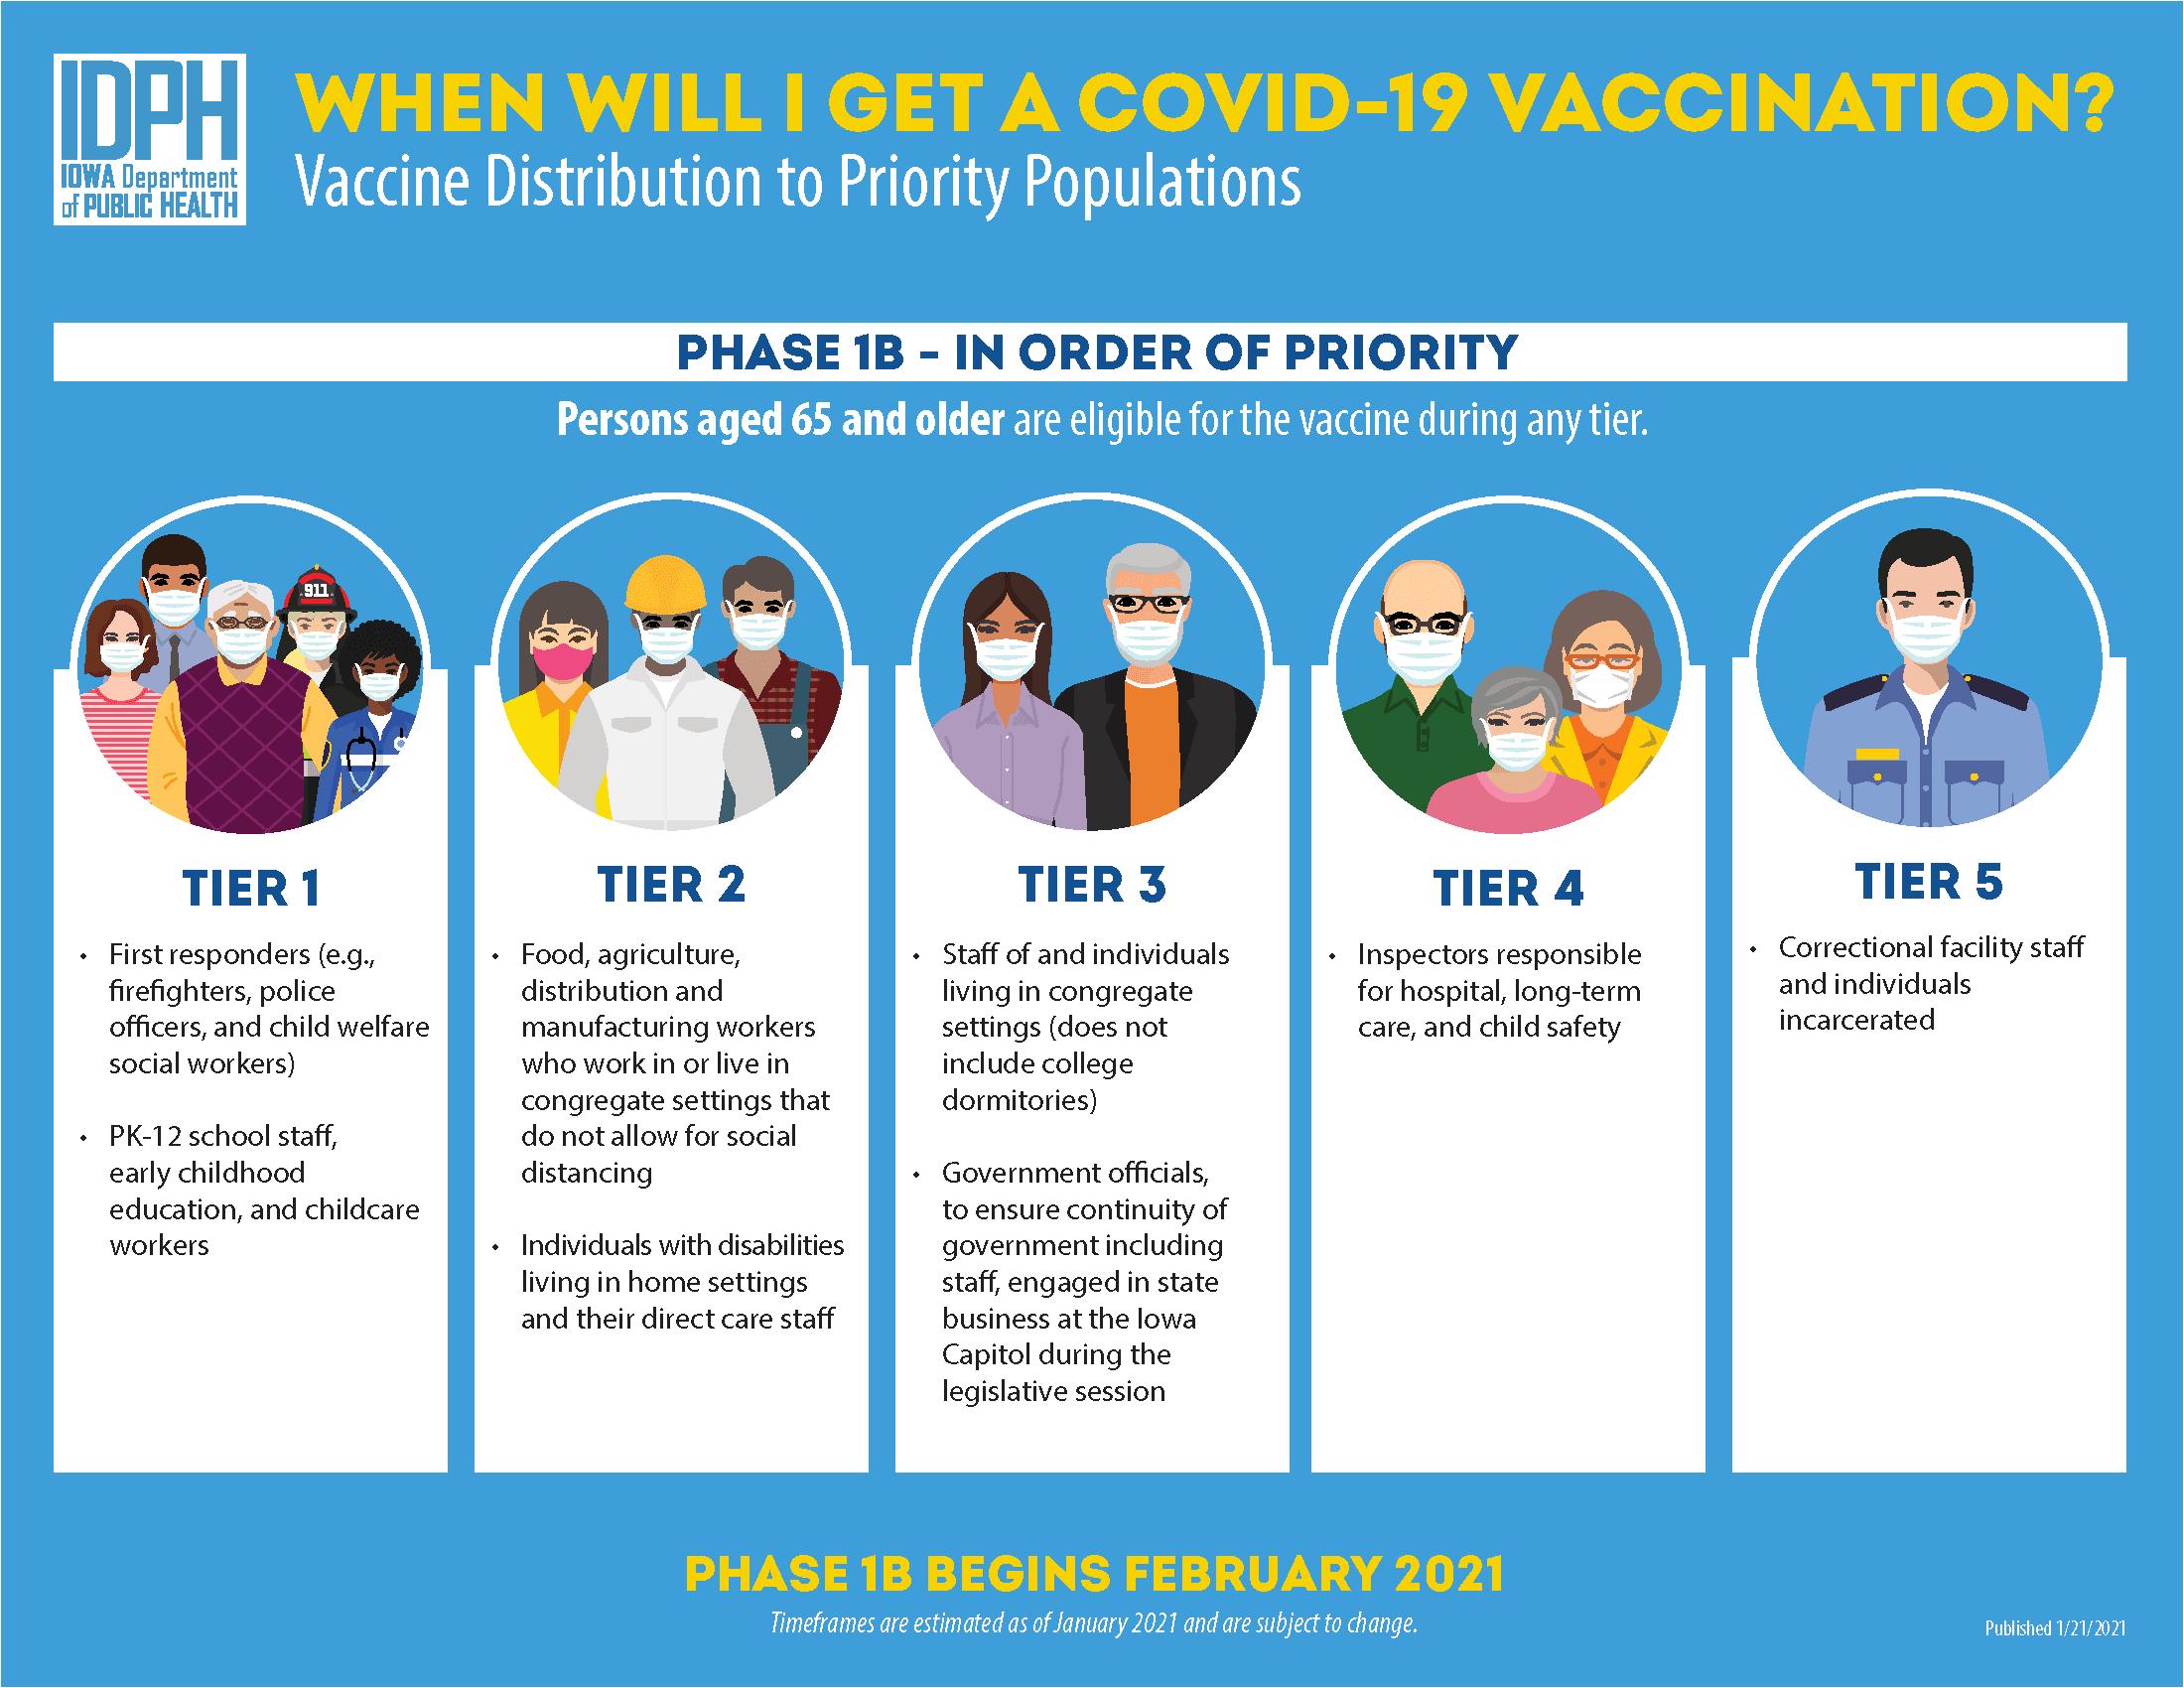 Vaccine Phase 1B Tiers 1